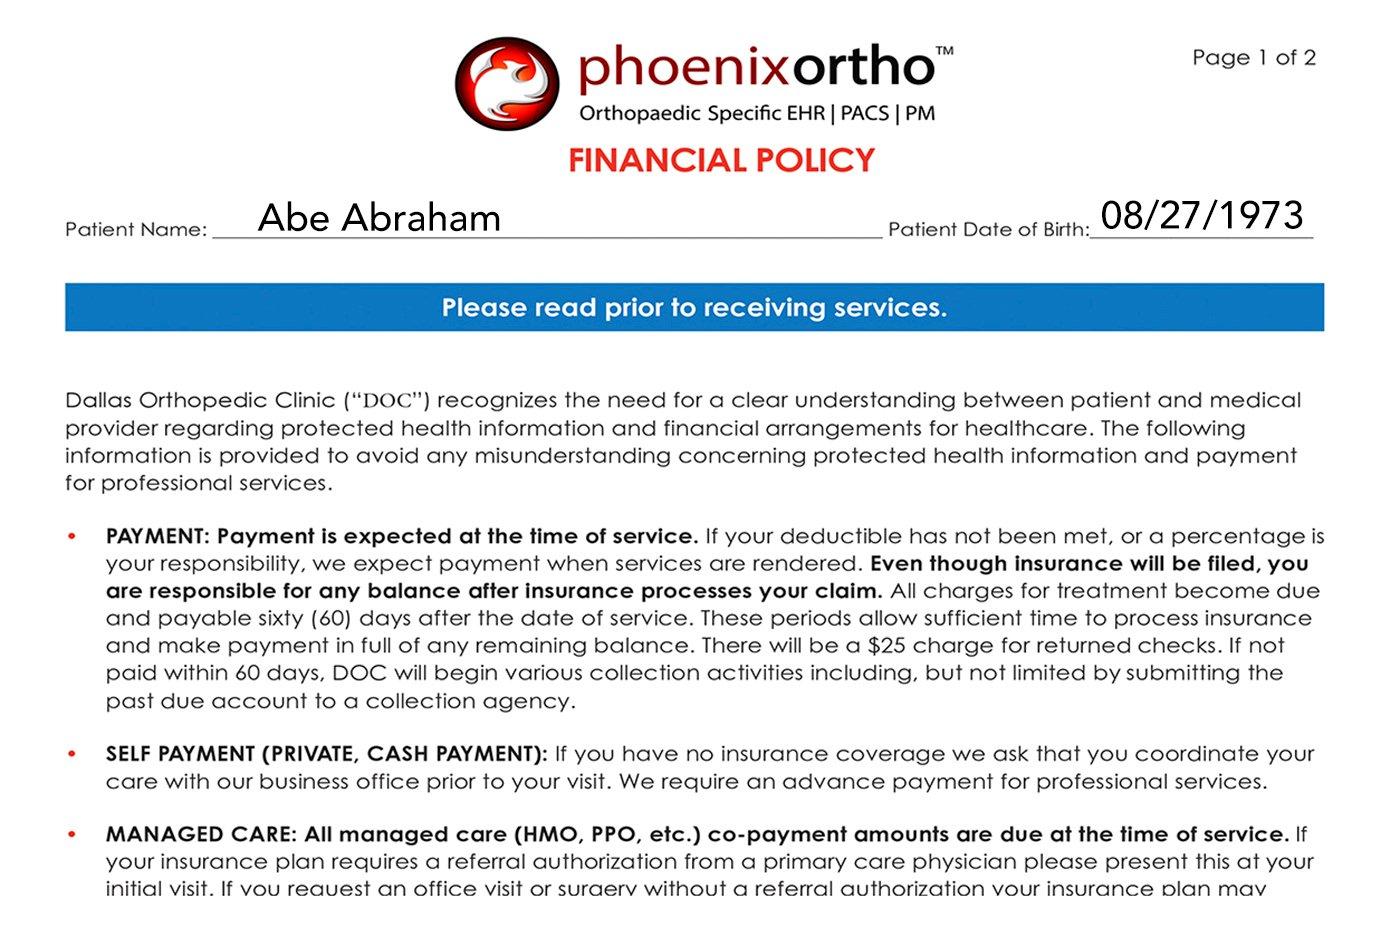 kiosk LP screenshots financial policy Abe